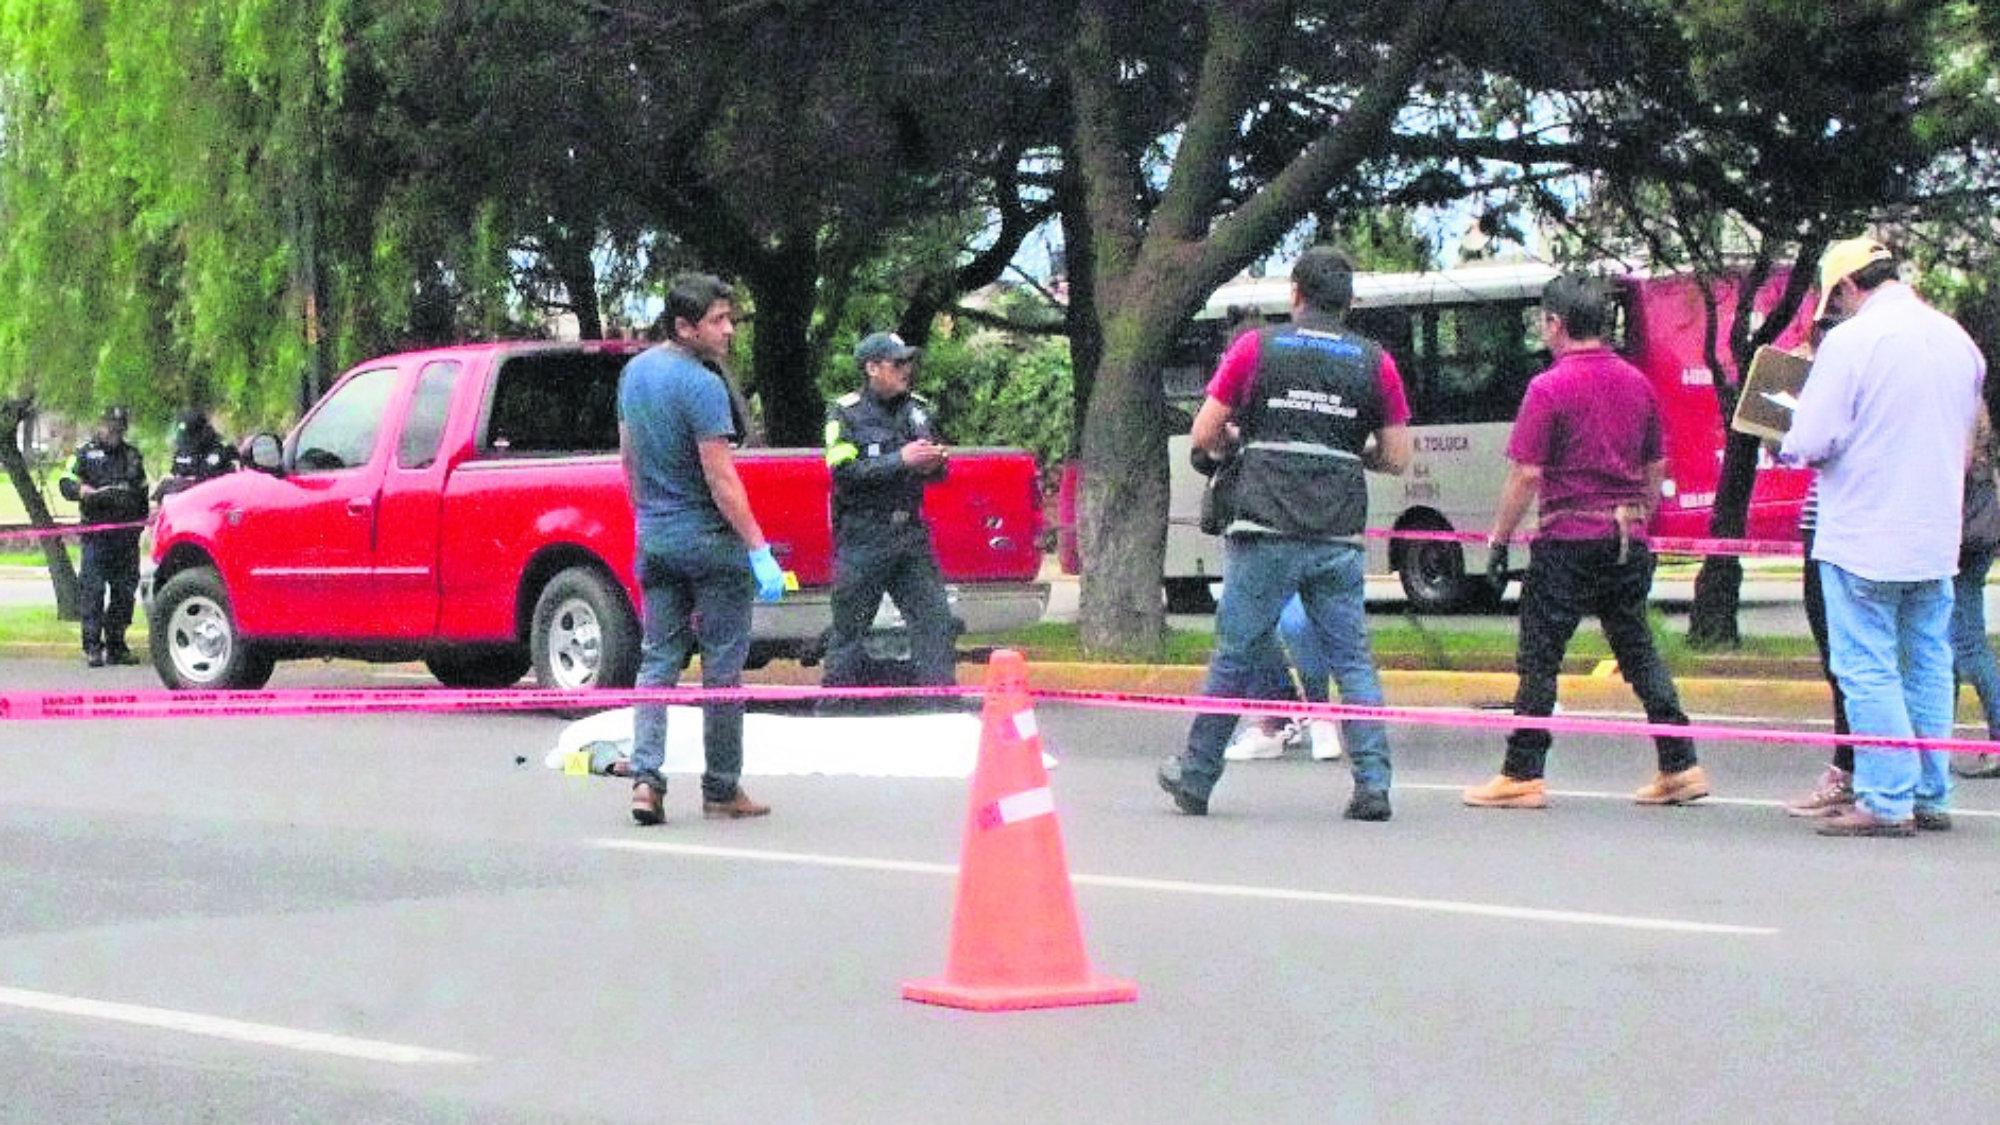 Arrollan a peatón Conductor acelerado Edomex Toluca